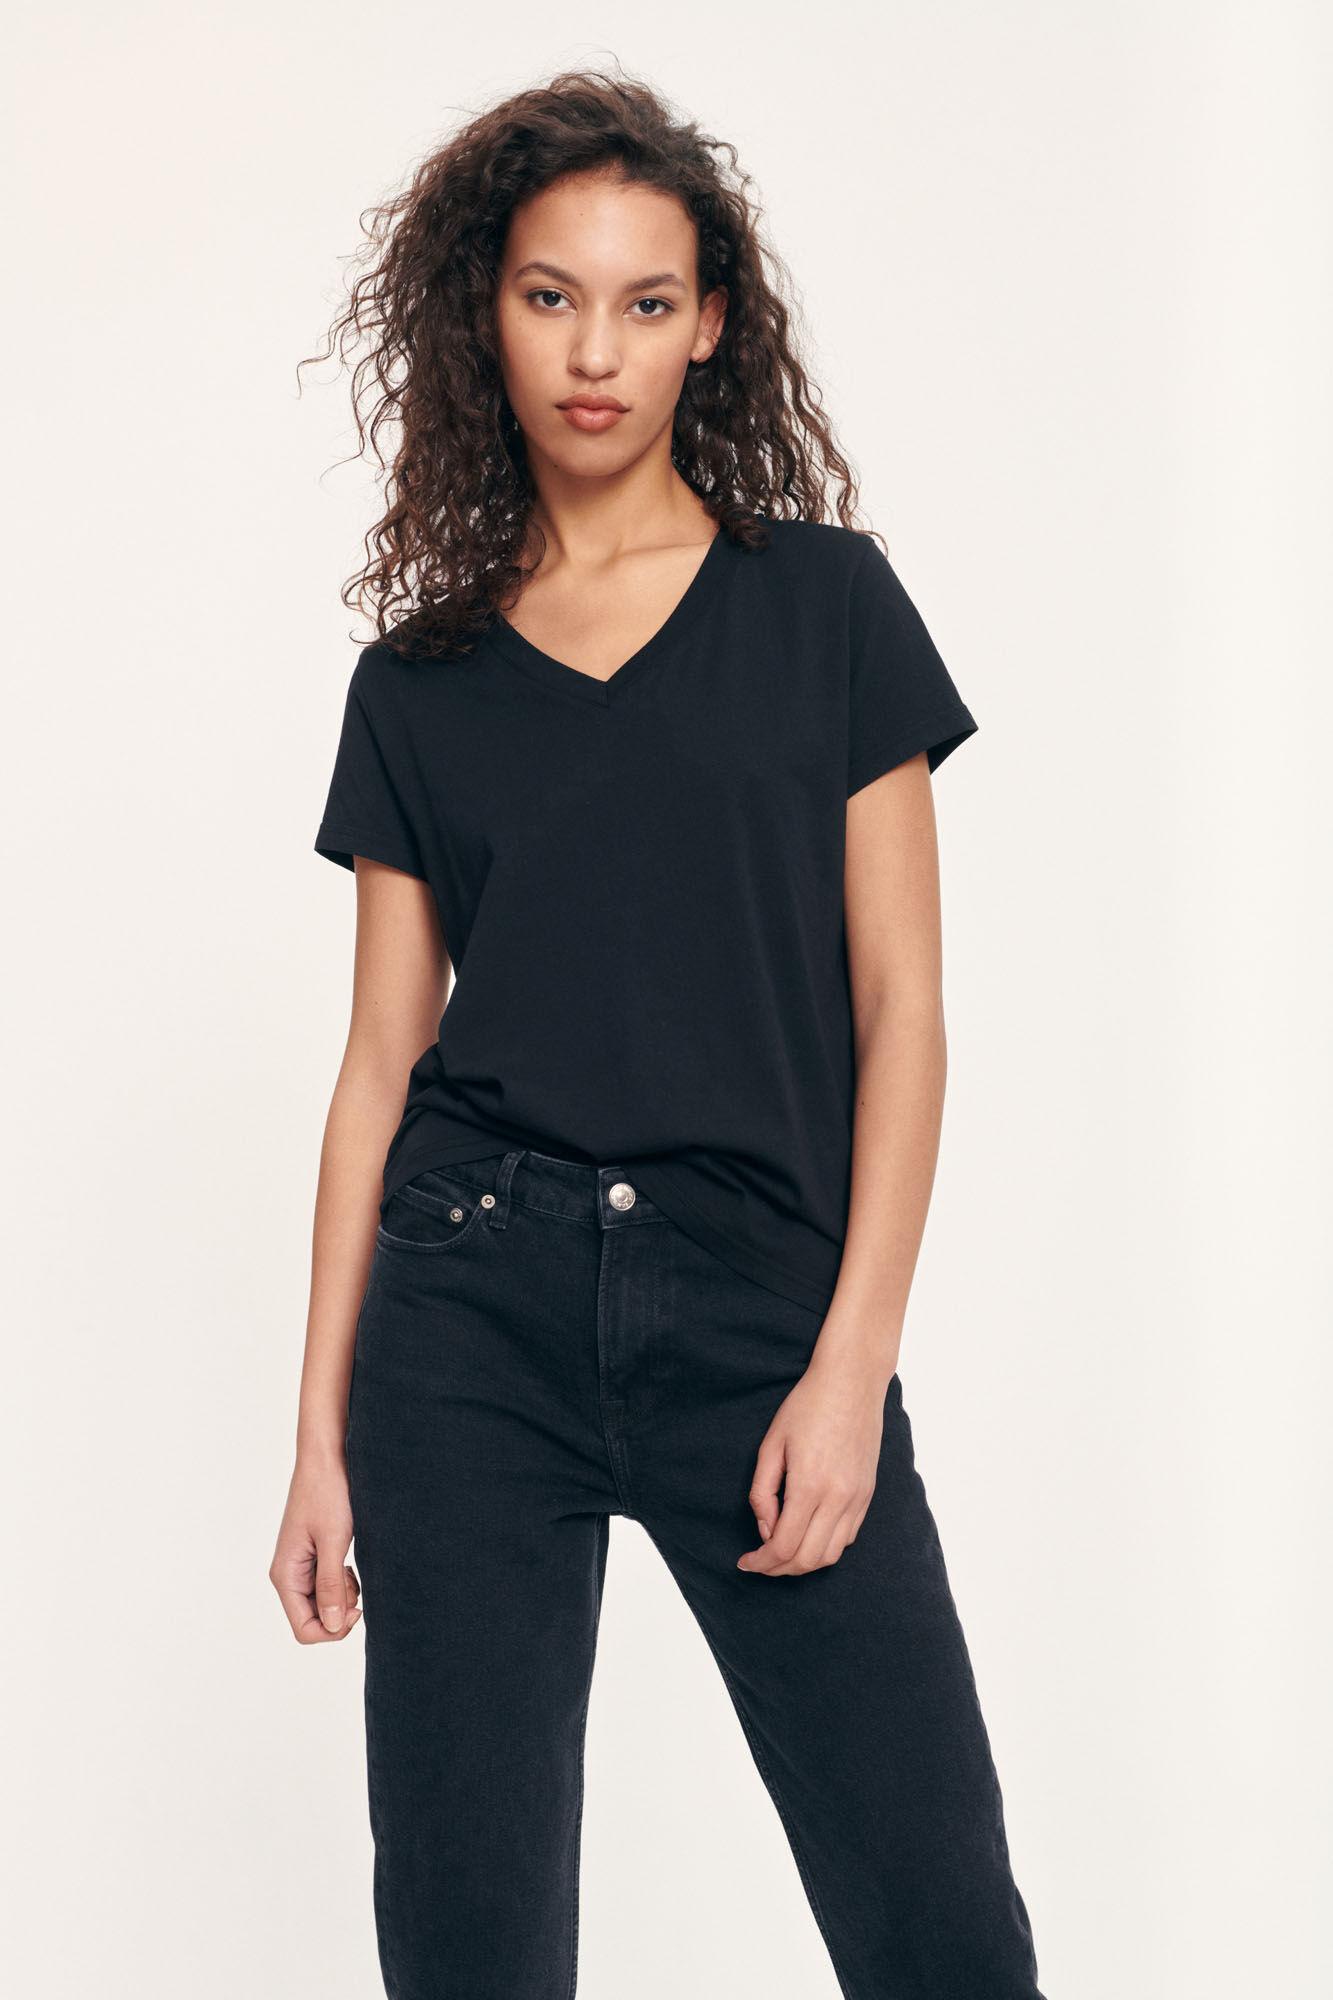 Solly v-n t-shirt 205